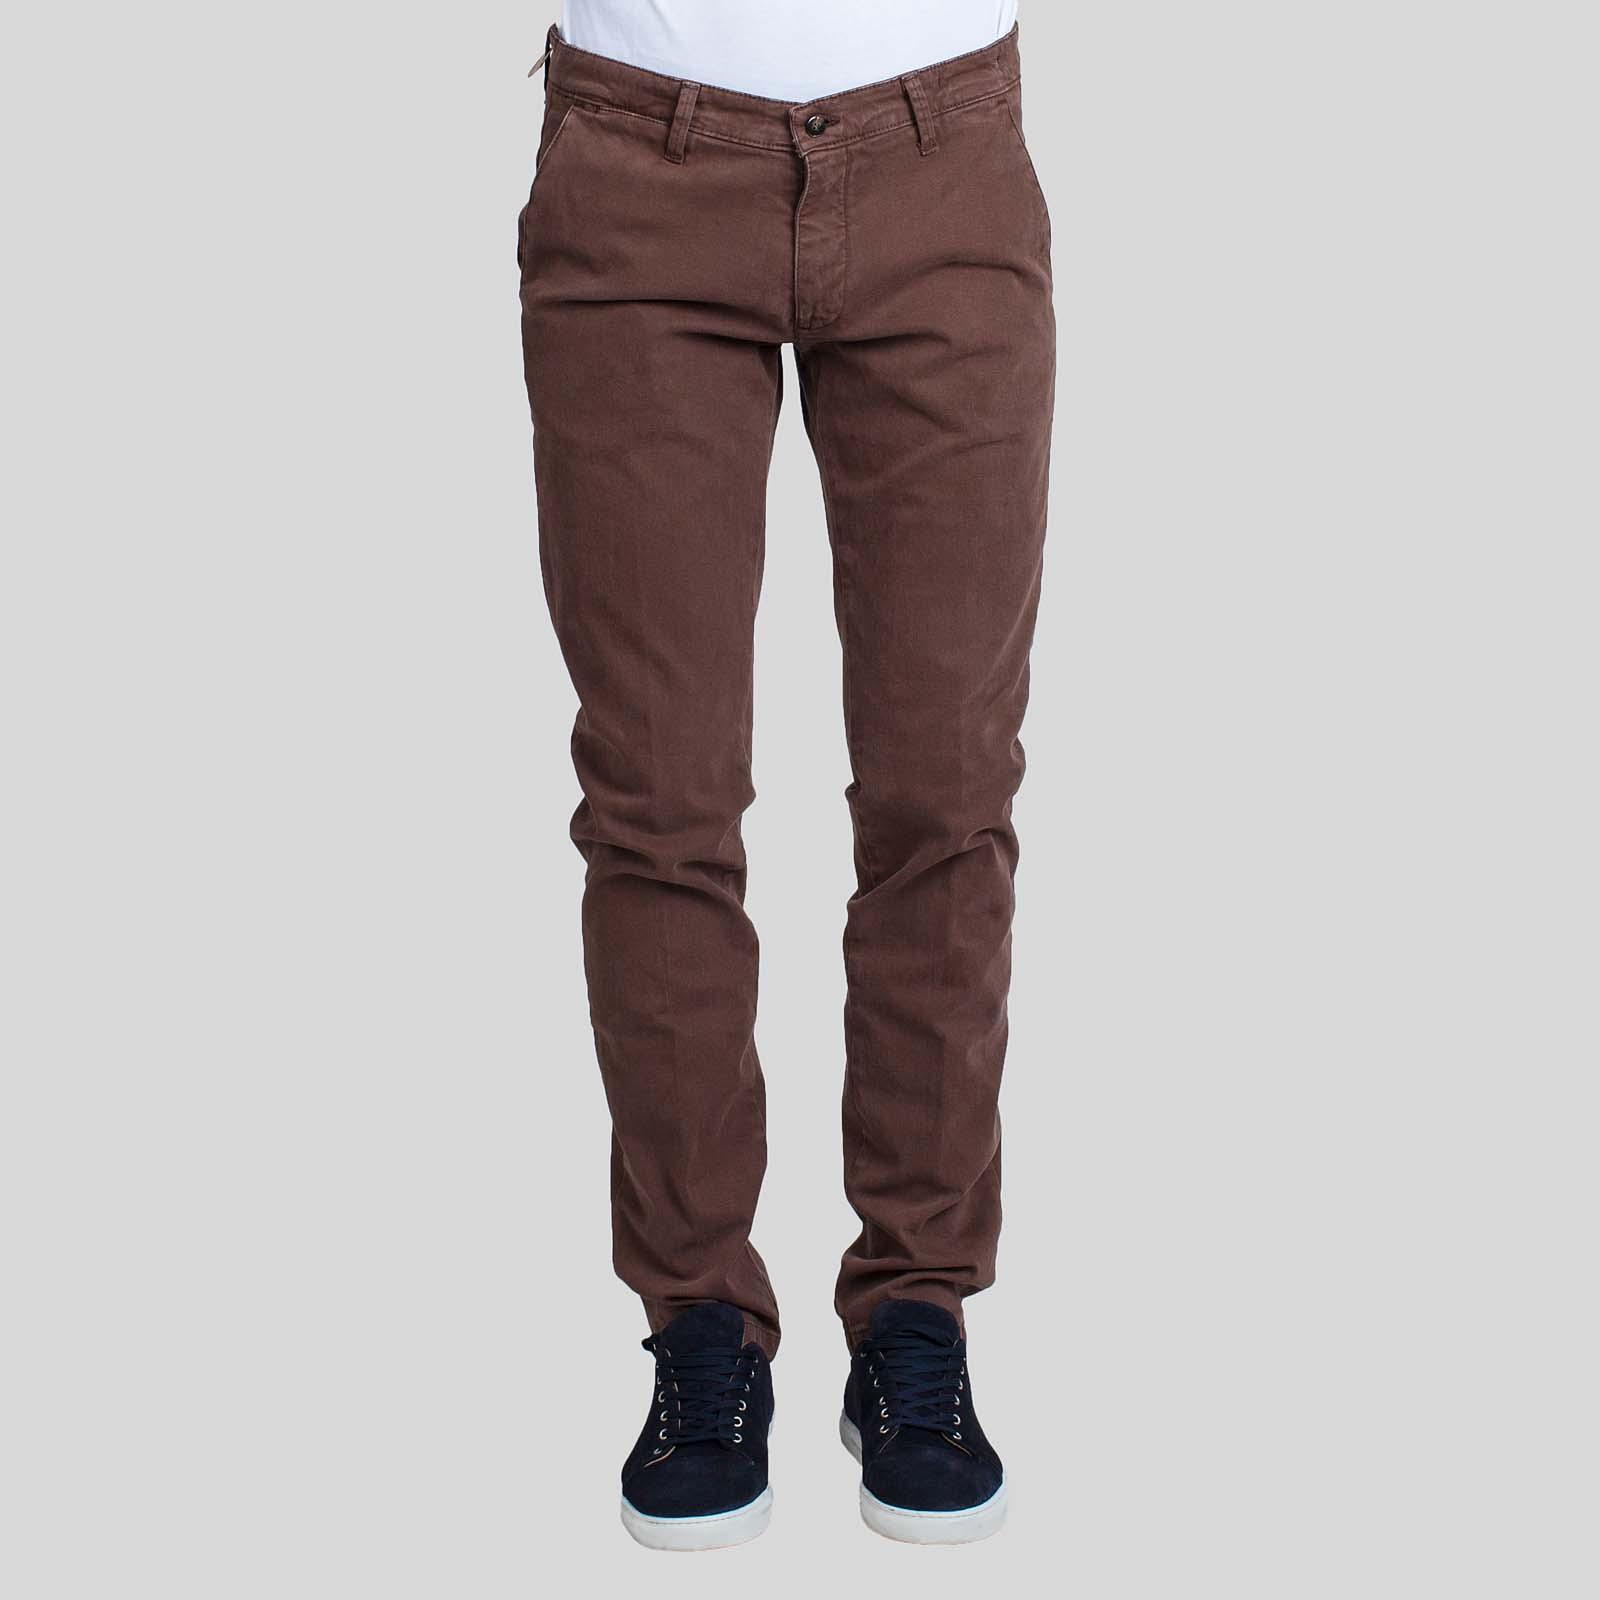 4/10 FOUR.TEN INDUSTRY Καφέ Παντελόνι Μέση με θηλιές ζώνης Κούμπωμα με φερμουάρ και κουμπί Δύο κάθετες τσέπες στο πλάι Δύο τσέπες πίσω Κανονική γραμμή Μέγεθος δείγματος : 48 Σύνθεση: 98% Βαμβάκι, 2% Ελαστίνη